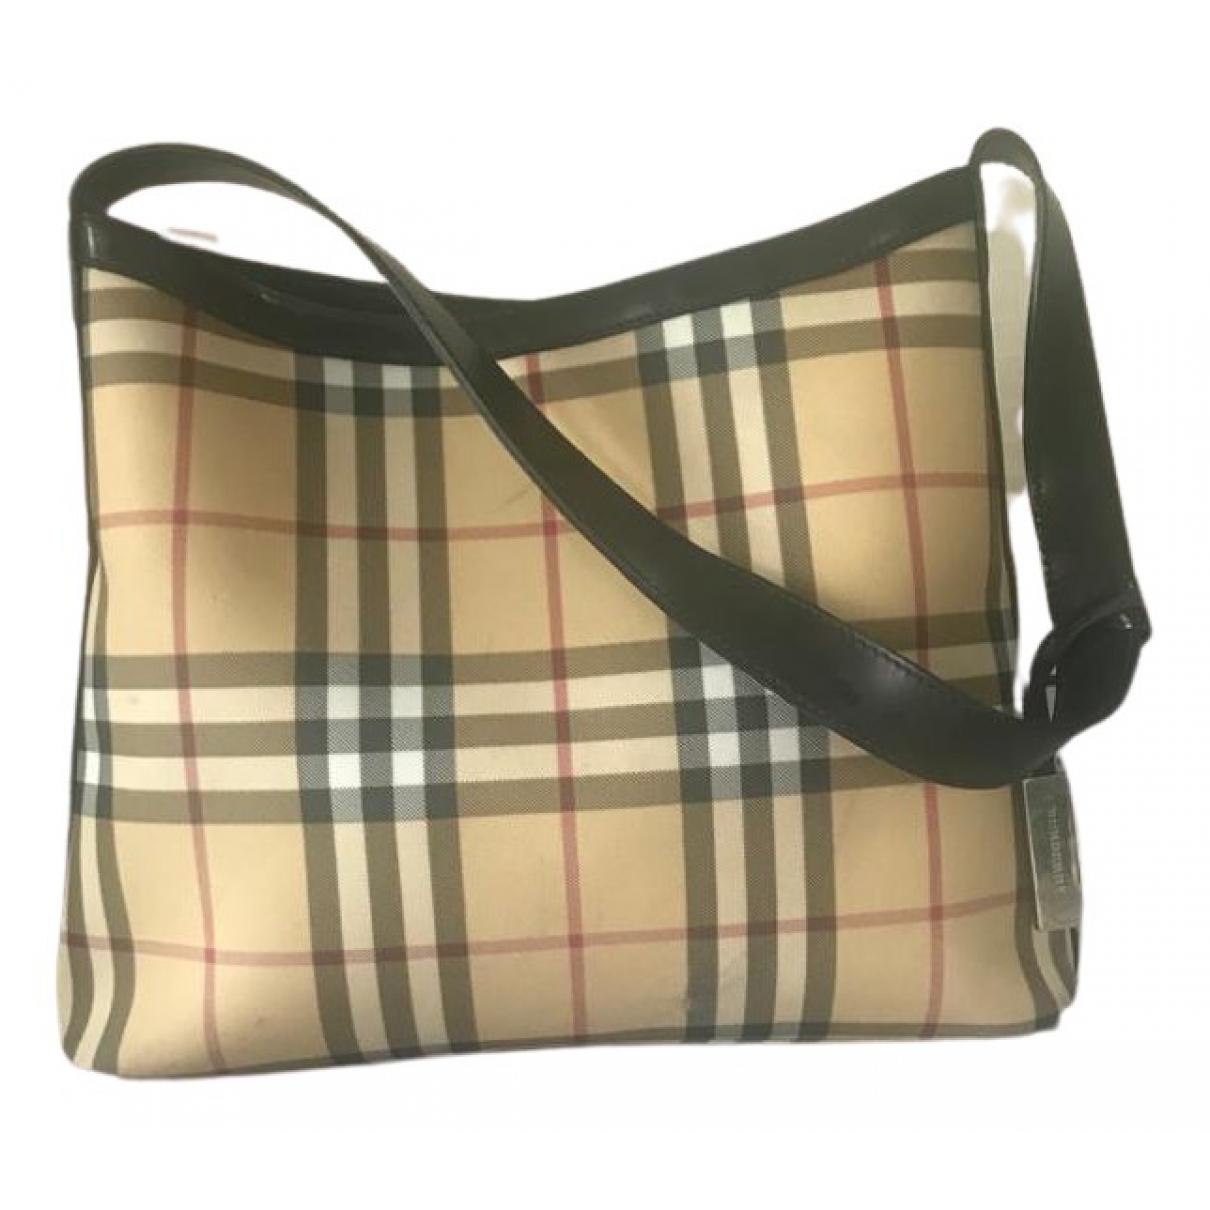 Burberry N Cloth handbag for Women N